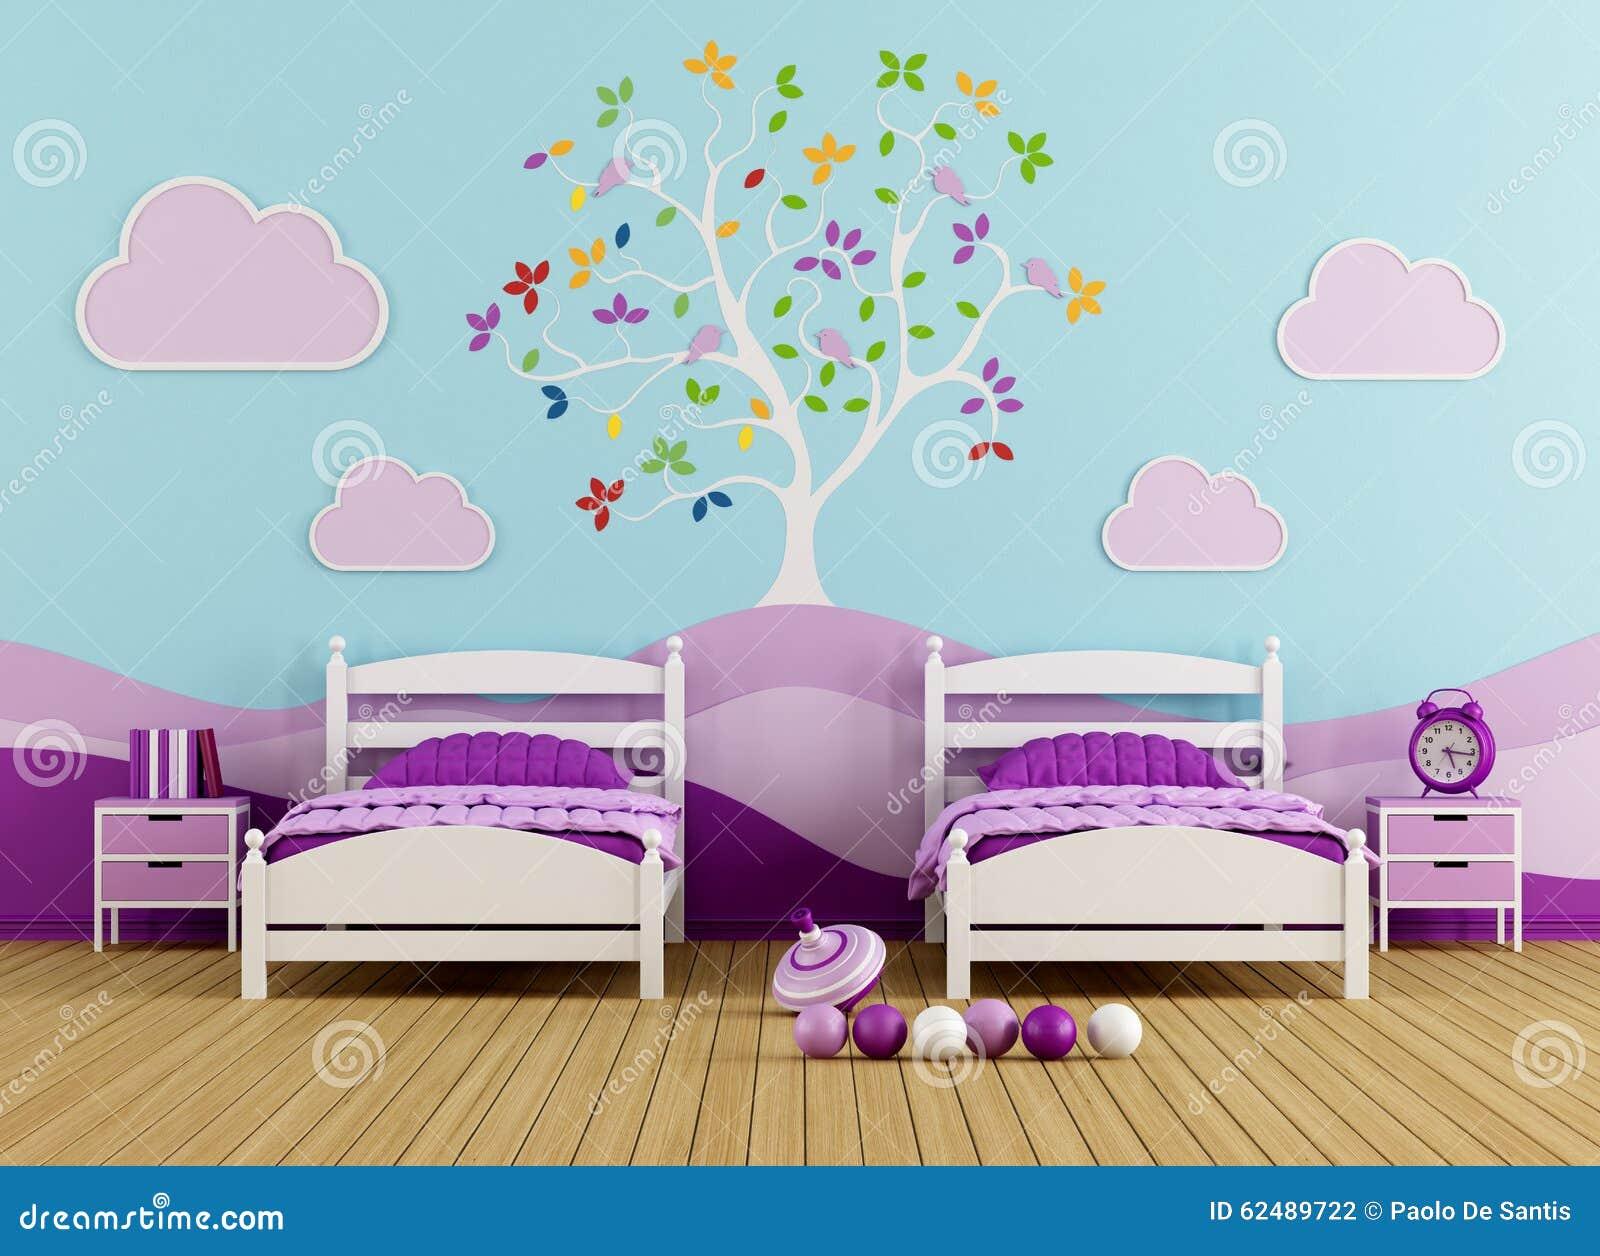 Kleur het concept woonkamer groen - Slaapkamer kleur meisje ...